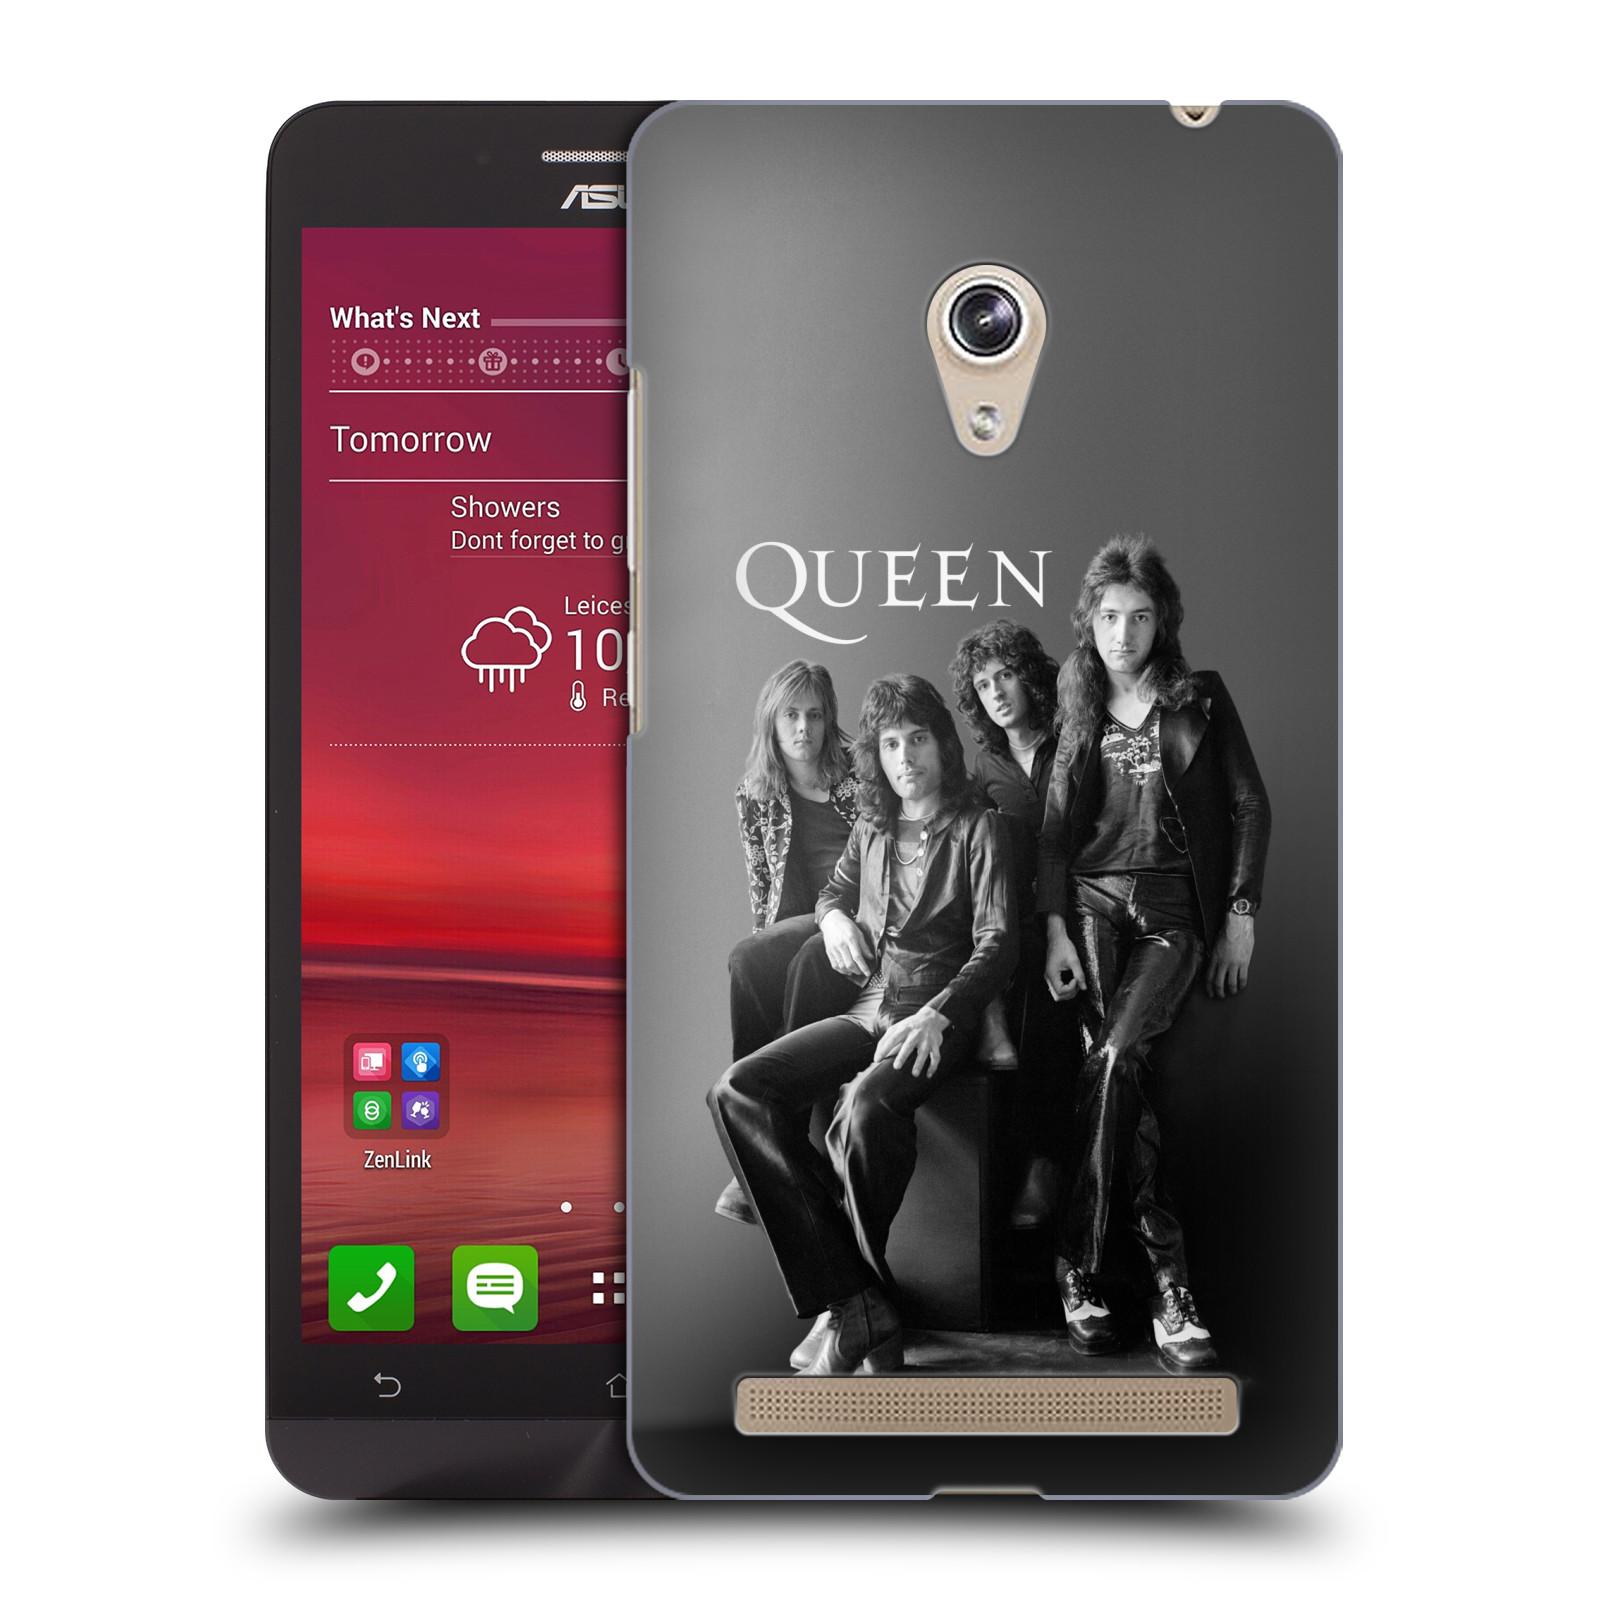 Plastové pouzdro na mobil Asus Zenfone 6 HEAD CASE Queen - Skupina (Plastový kryt či obal na mobilní telefon licencovaným motivem Queen pro Asus Zenfone 6 A600CG / A601CG)